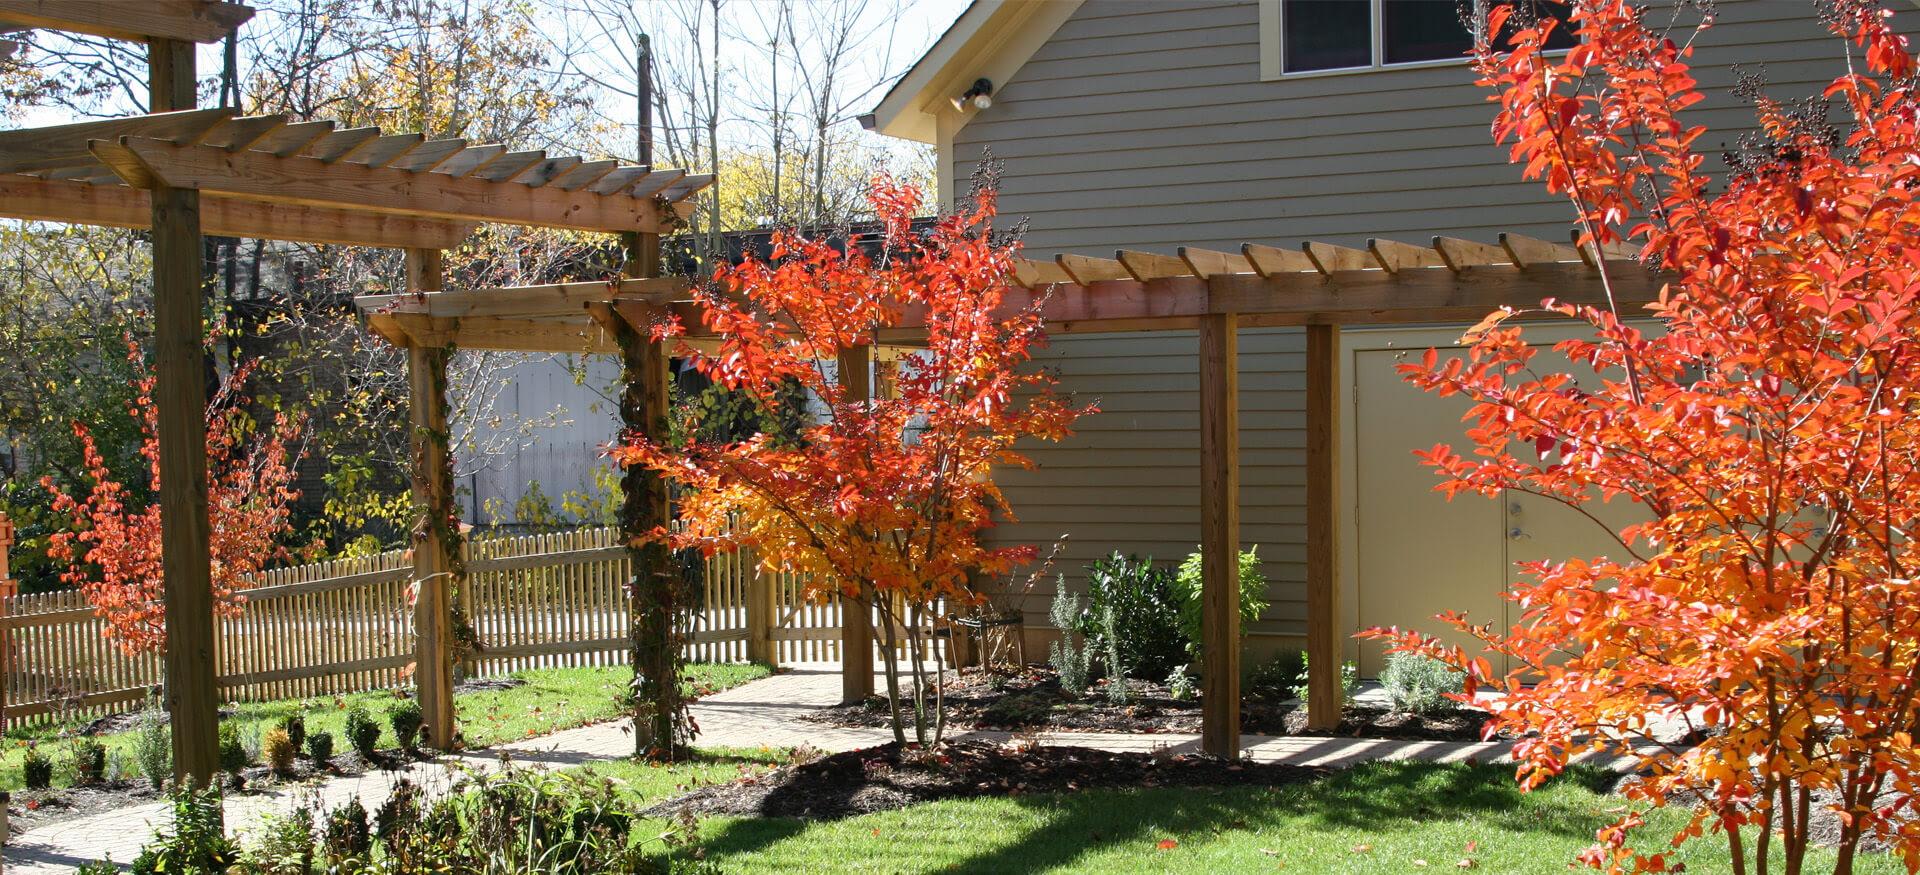 Landscape Design Near Me | Landscaping Services Knoxville TN